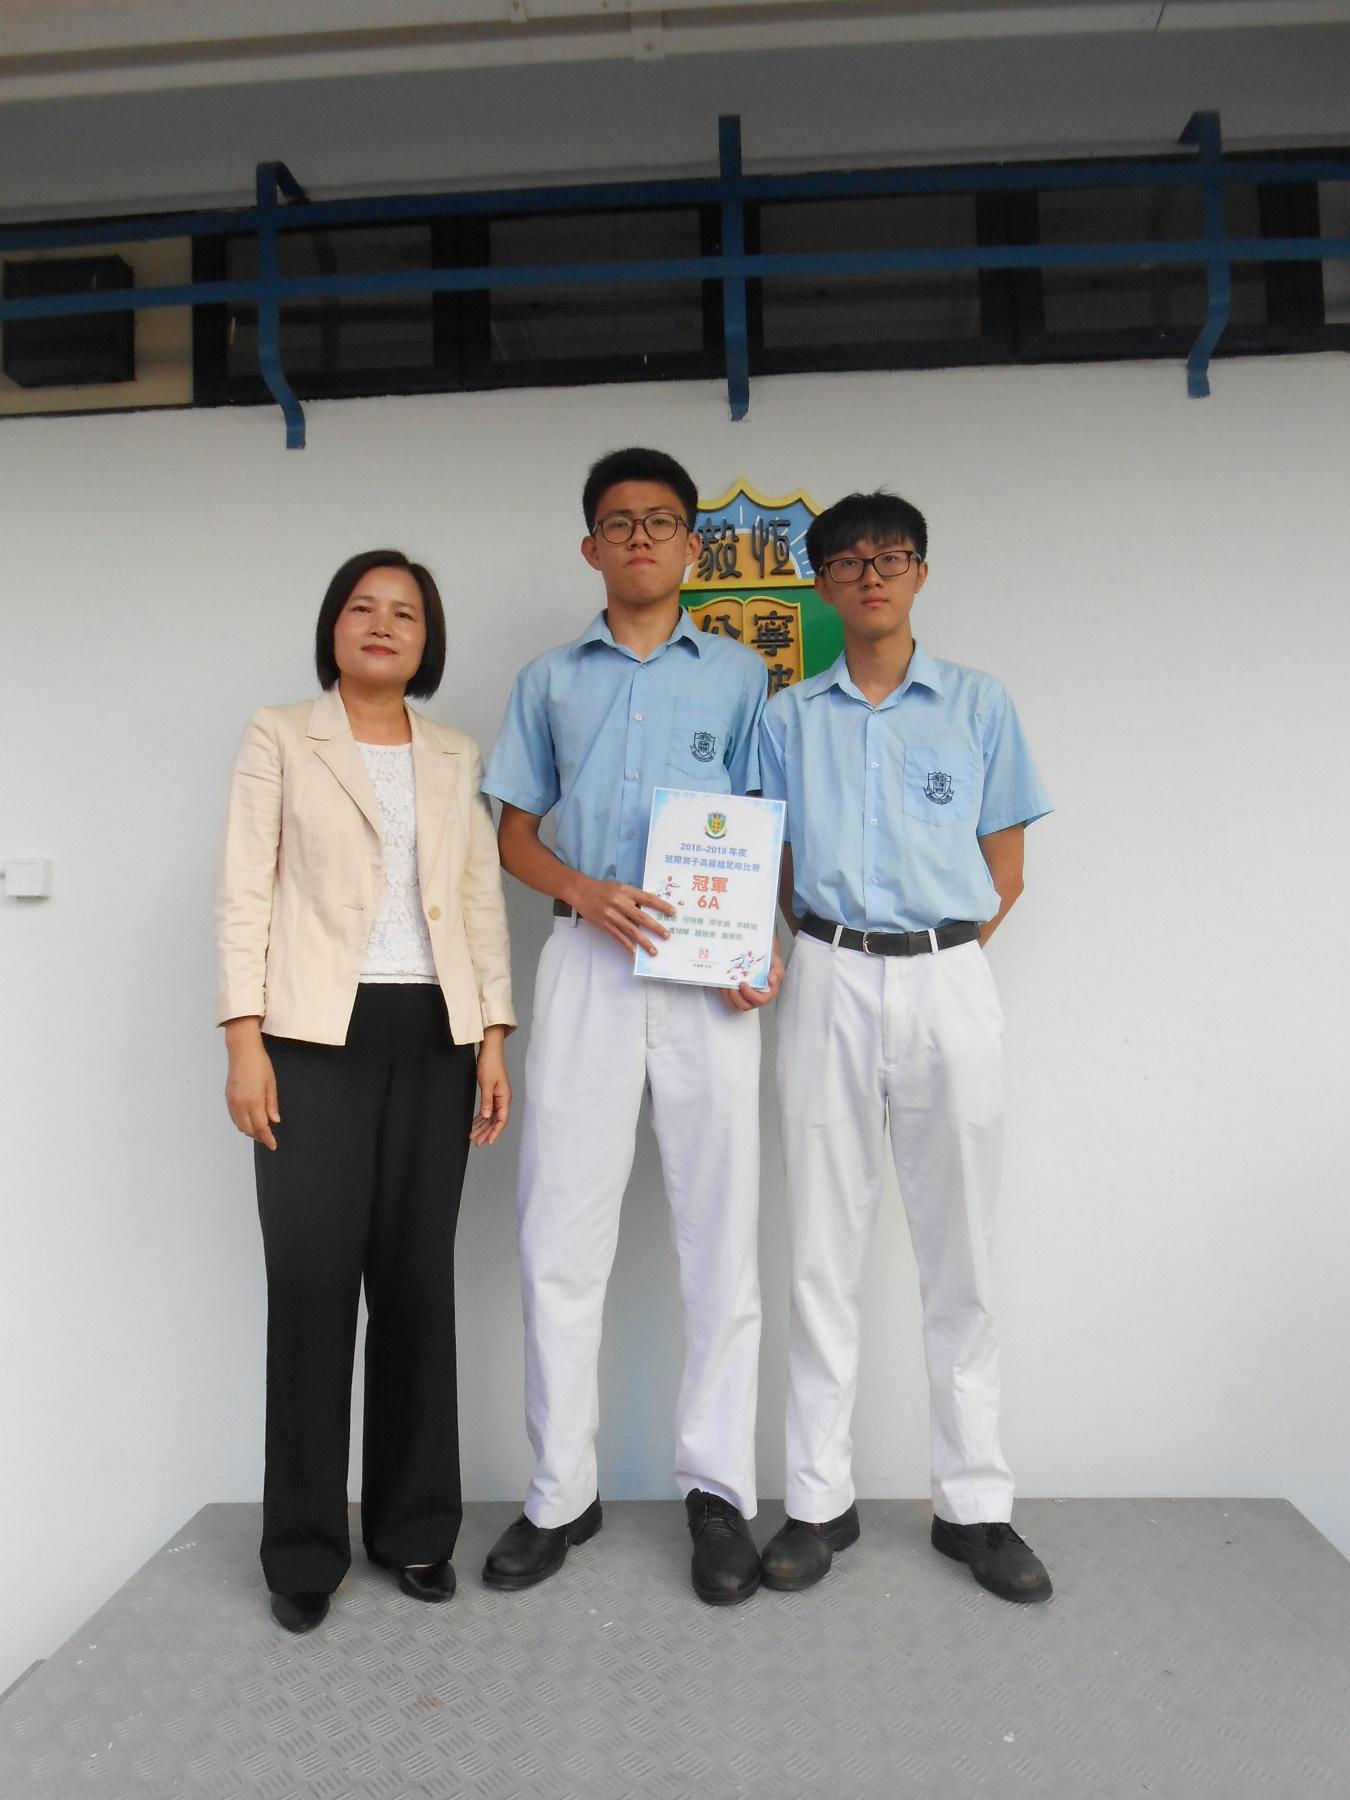 http://npc.edu.hk/sites/default/files/dscn9711.jpg